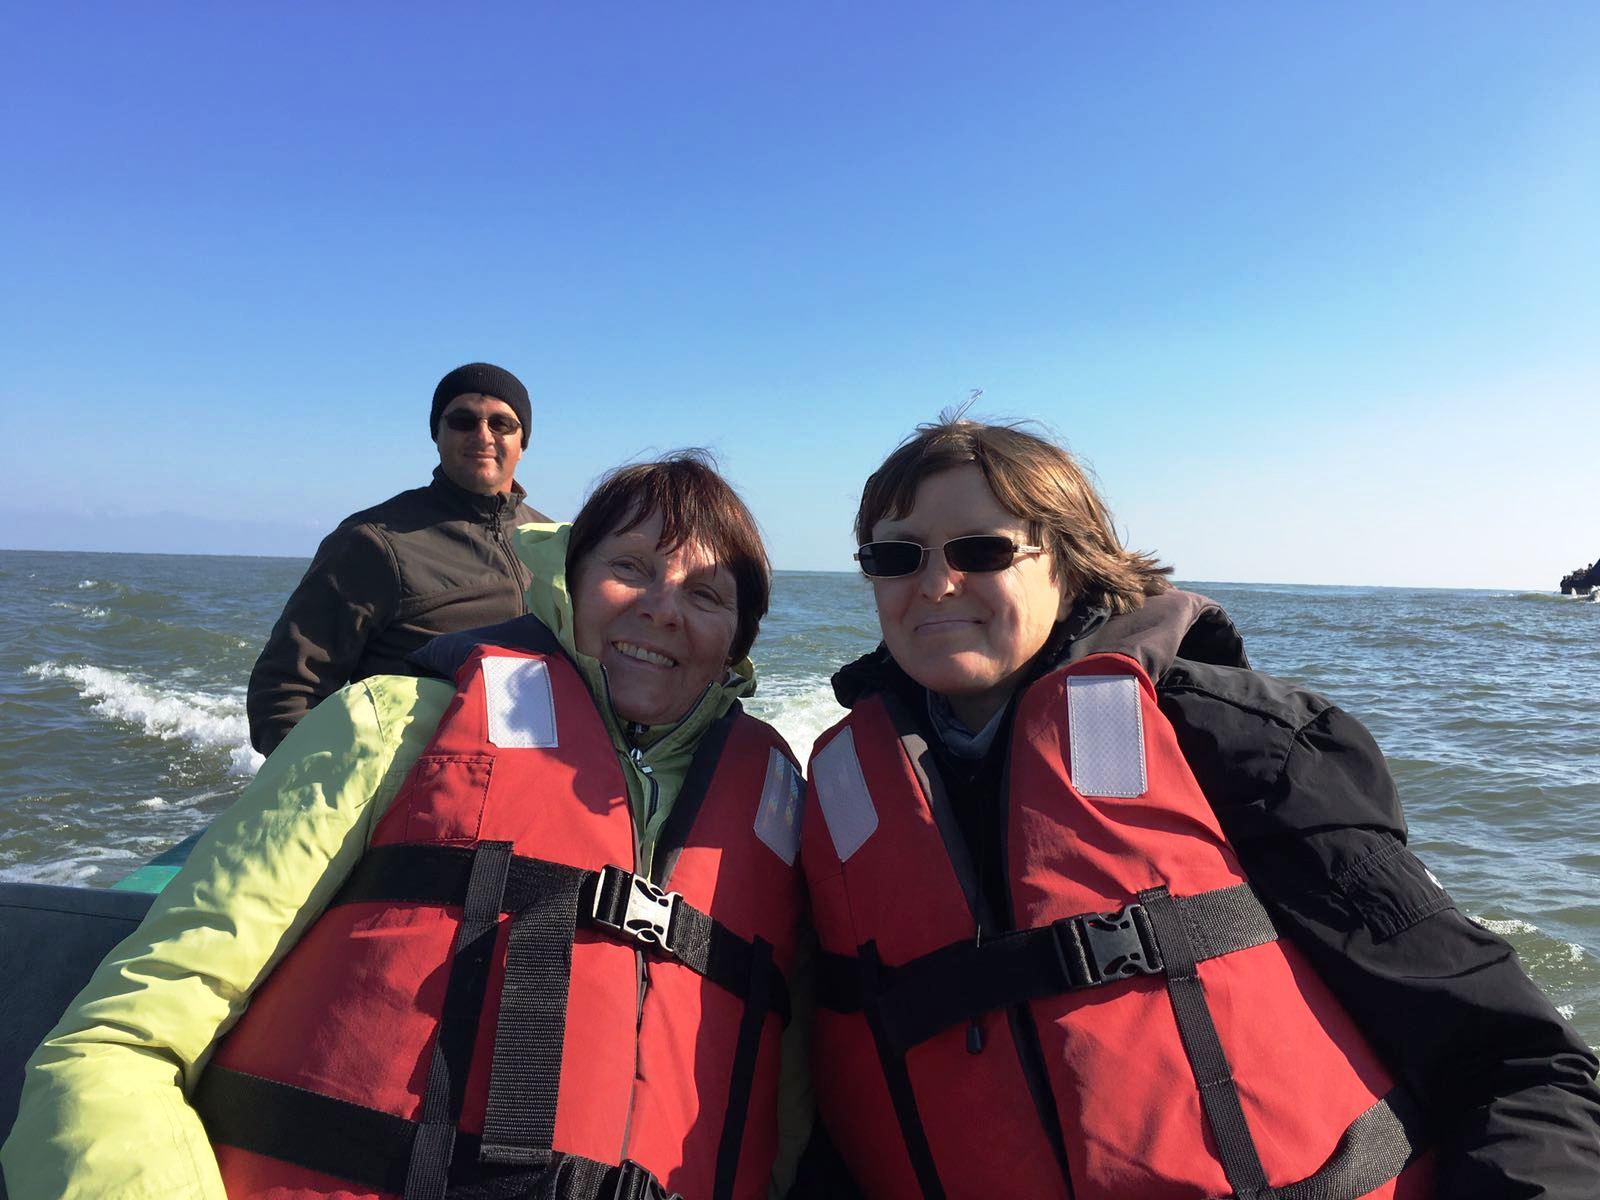 Trip Advisor Boat Tours Of Lava Big Island